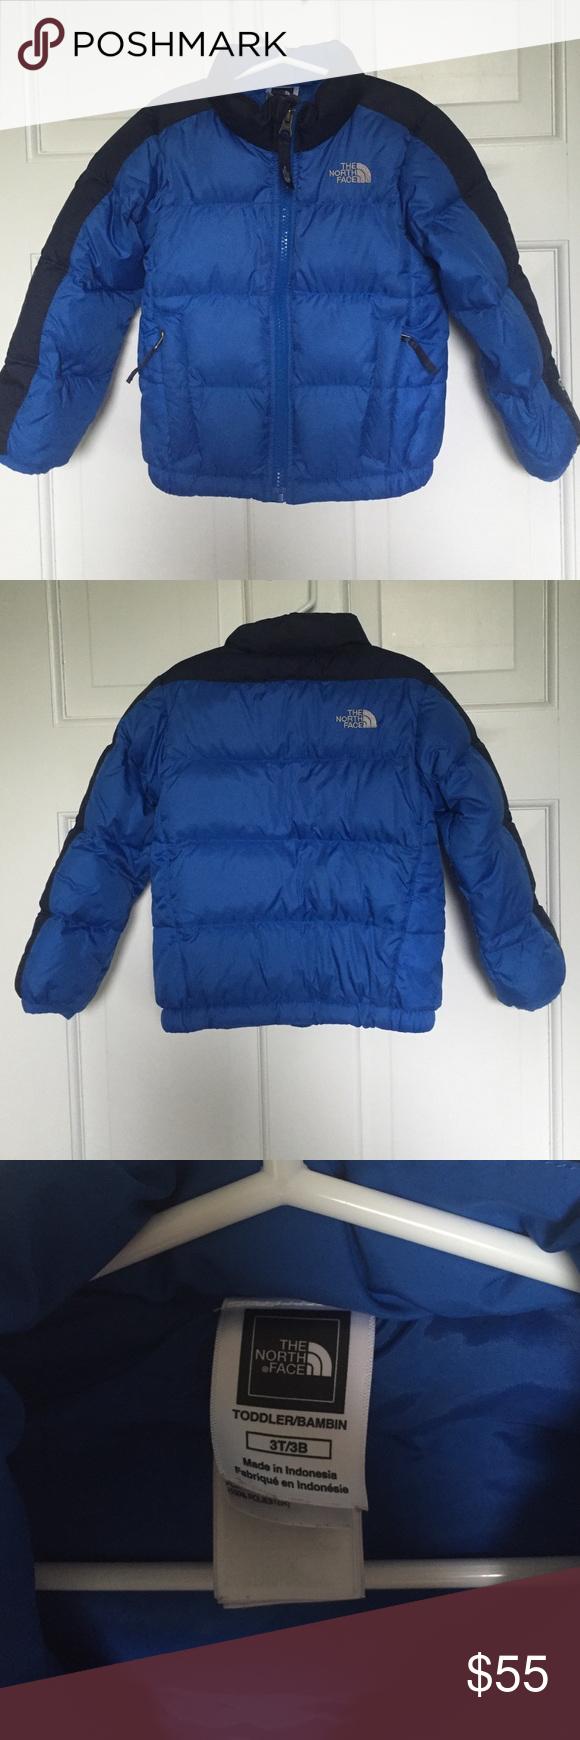 Selling This 3t North Face Down Puffer Jacket On Poshmark My Username Is Lindso8582 Shopmycloset Poshmark Fashion Shopping St Fashion Style Nike Jacket [ 1740 x 580 Pixel ]